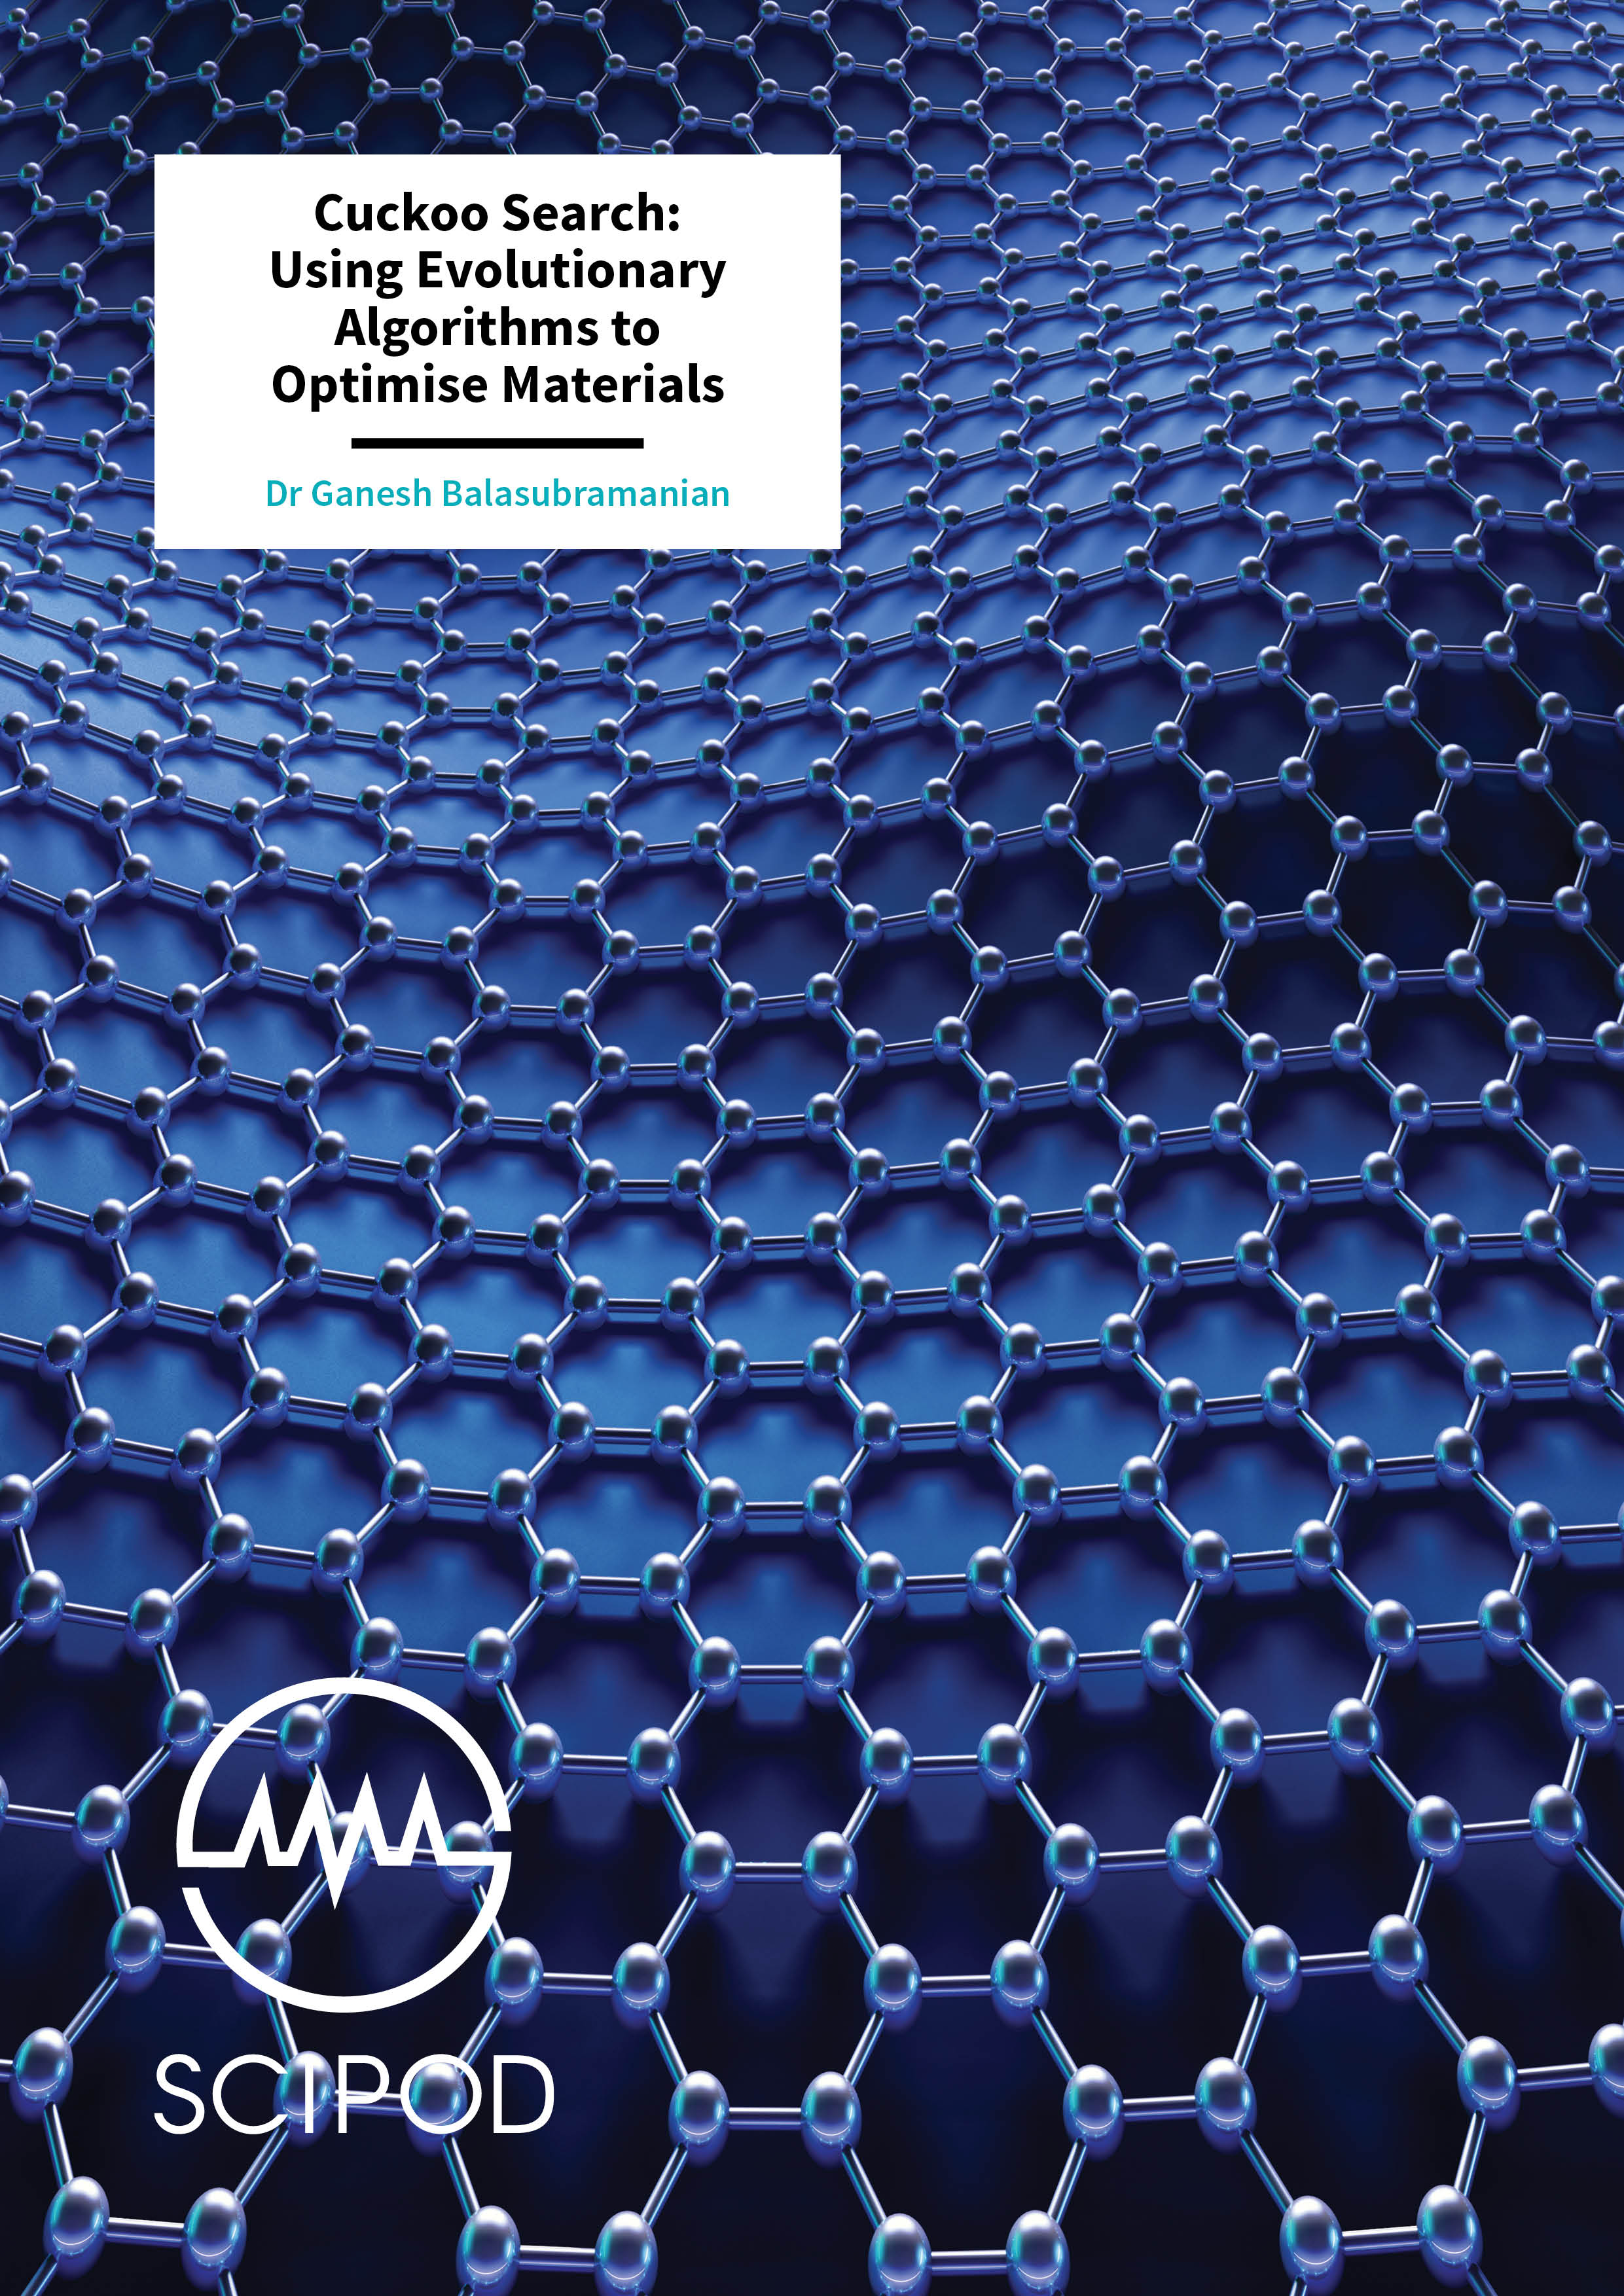 Cuckoo Search Using Evolutionary Algorithms to Optimise Materials – Dr Ganesh Balasubramanian, Lehigh University